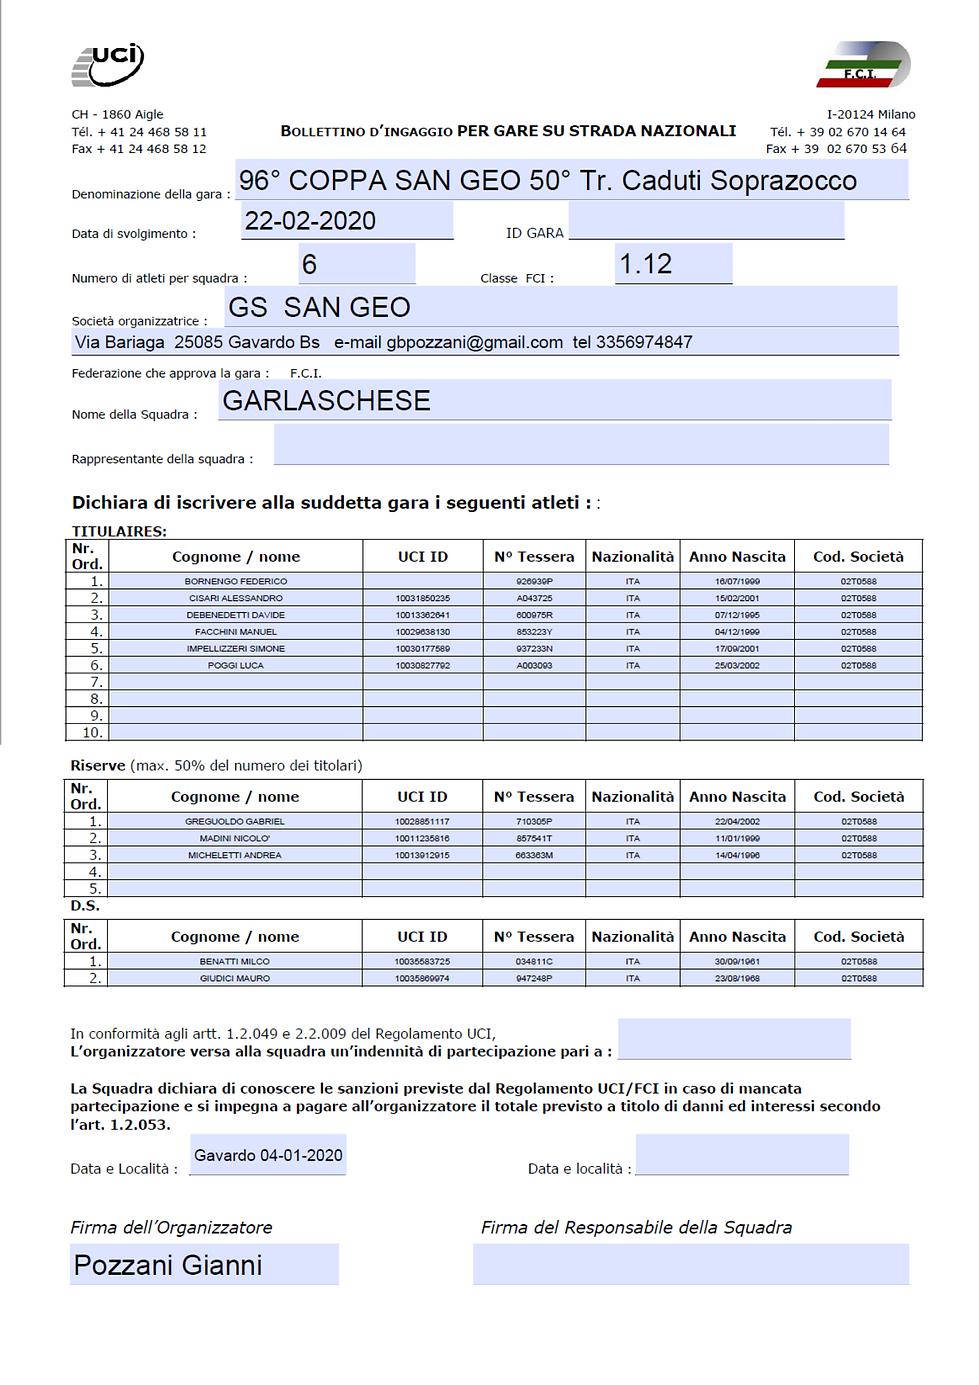 bollettino Team Garlaschese.png